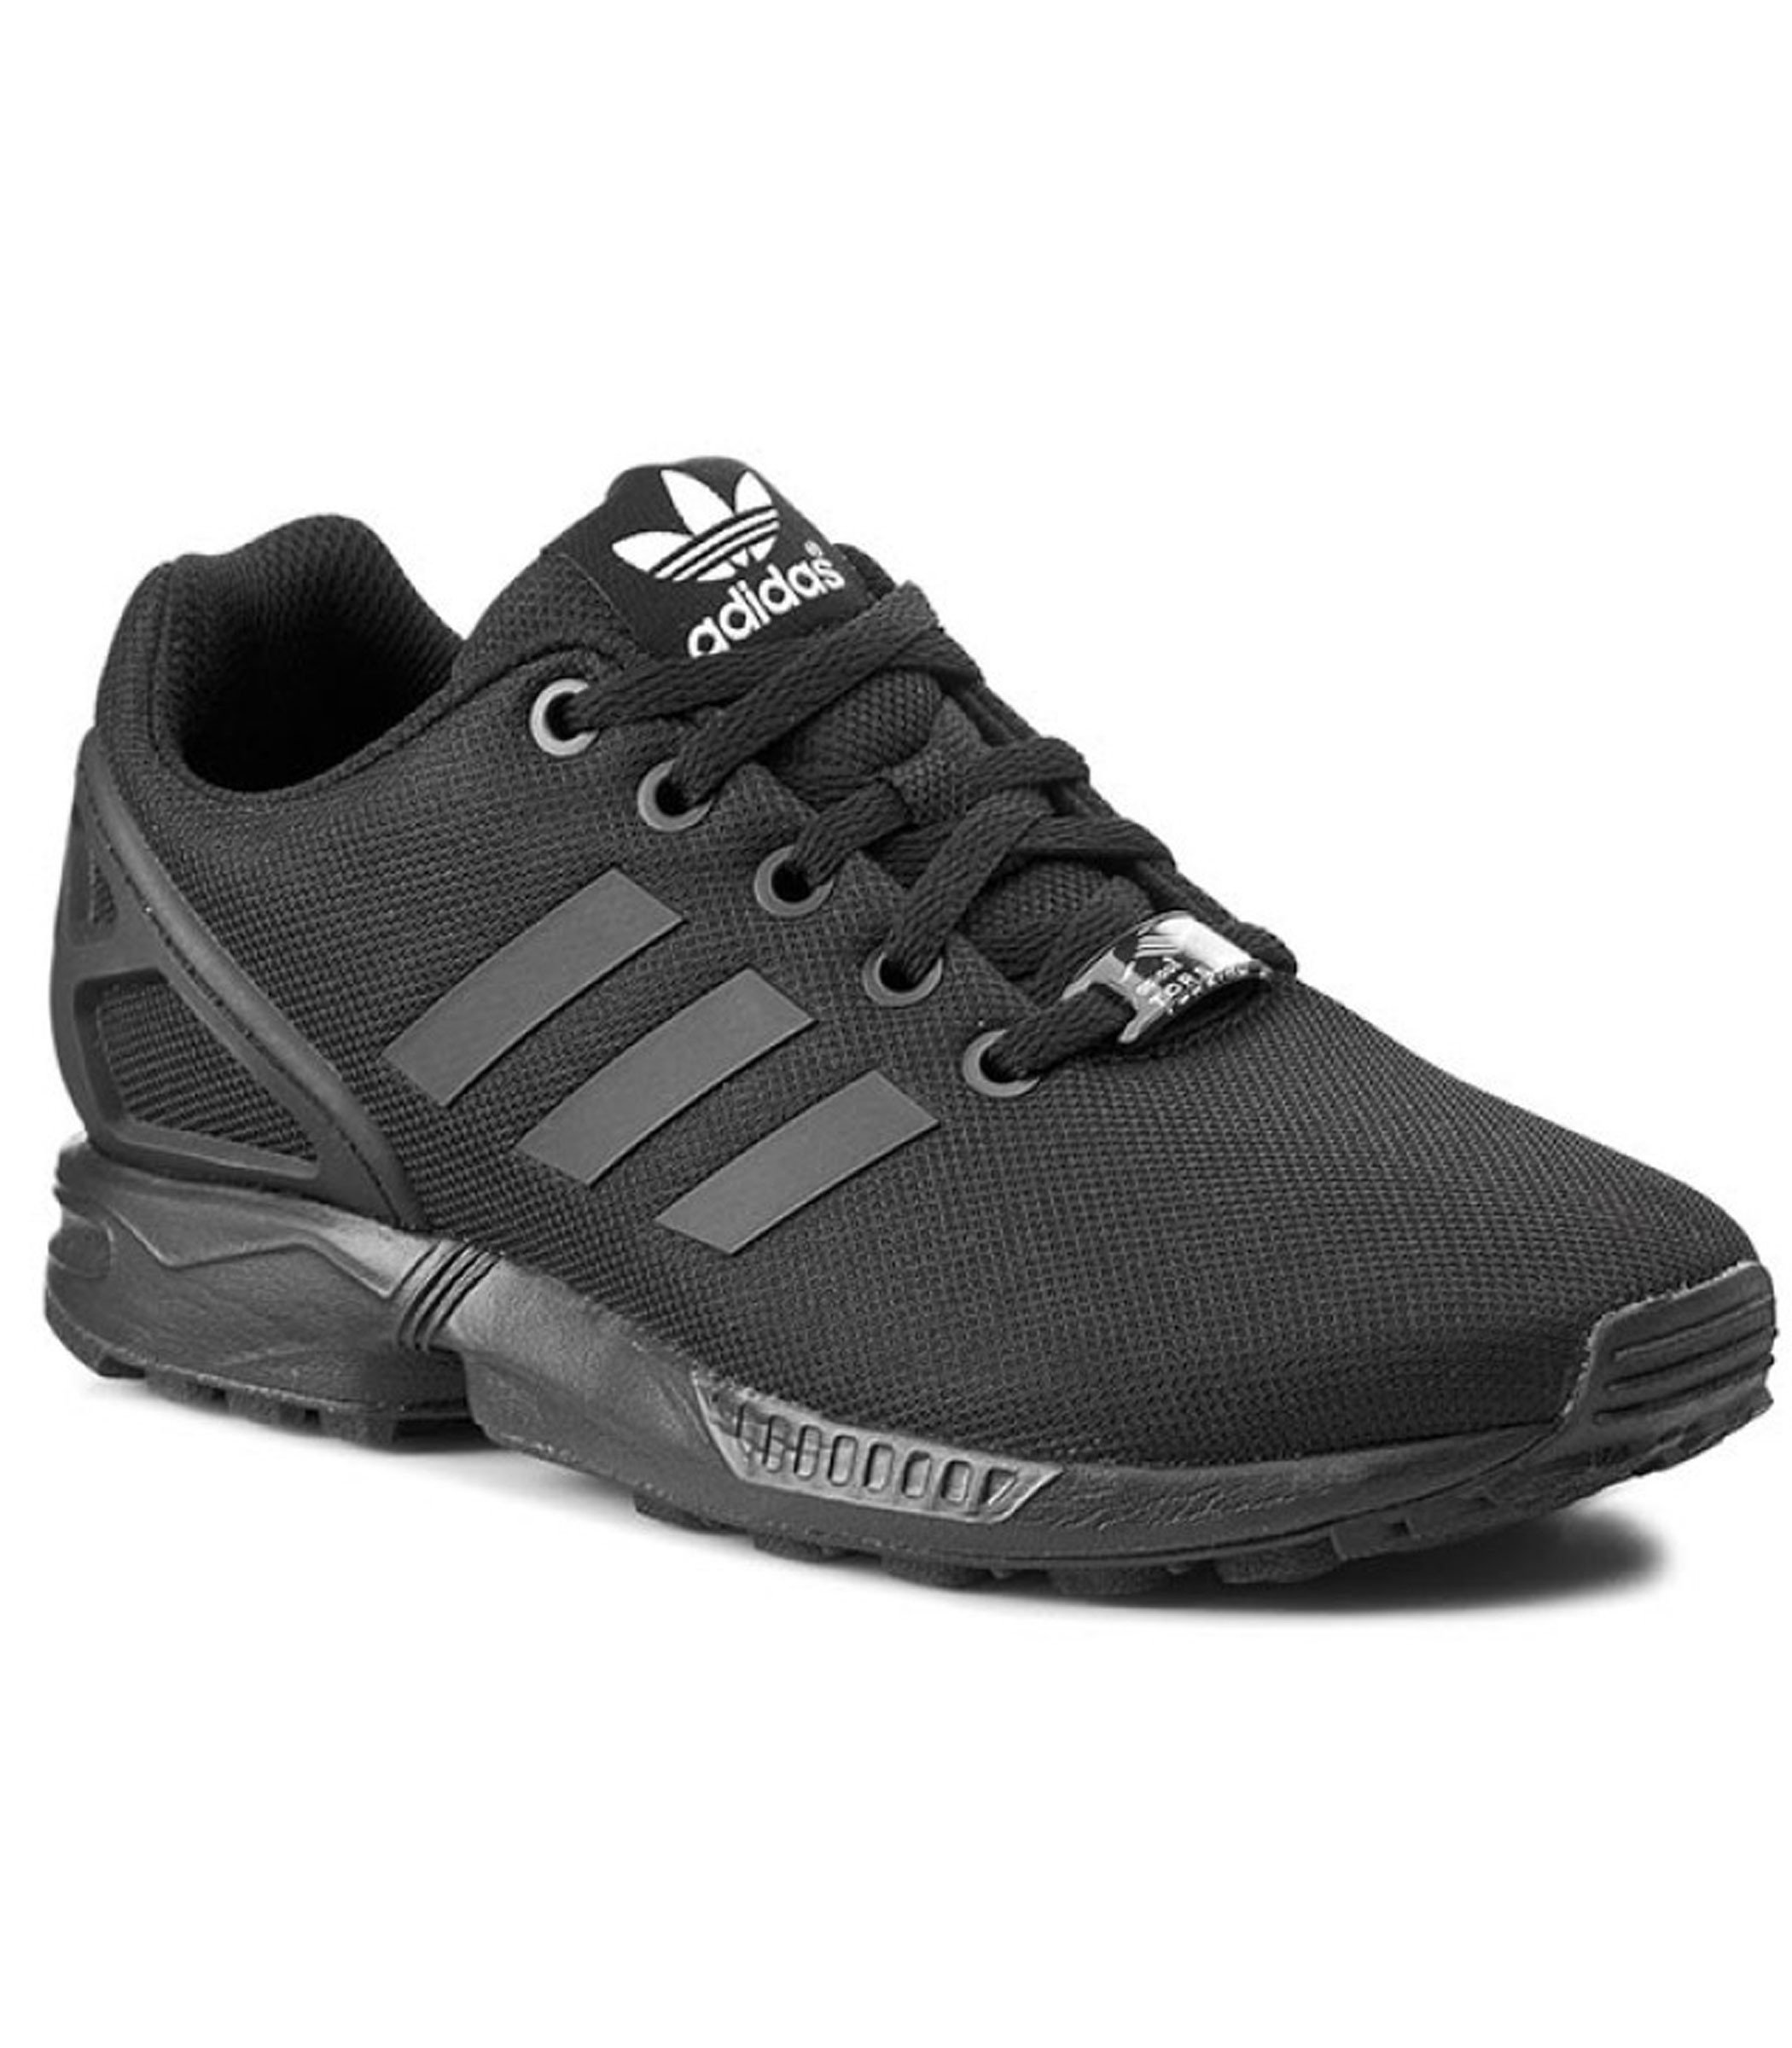 scarpe adidas ragazzo 2017